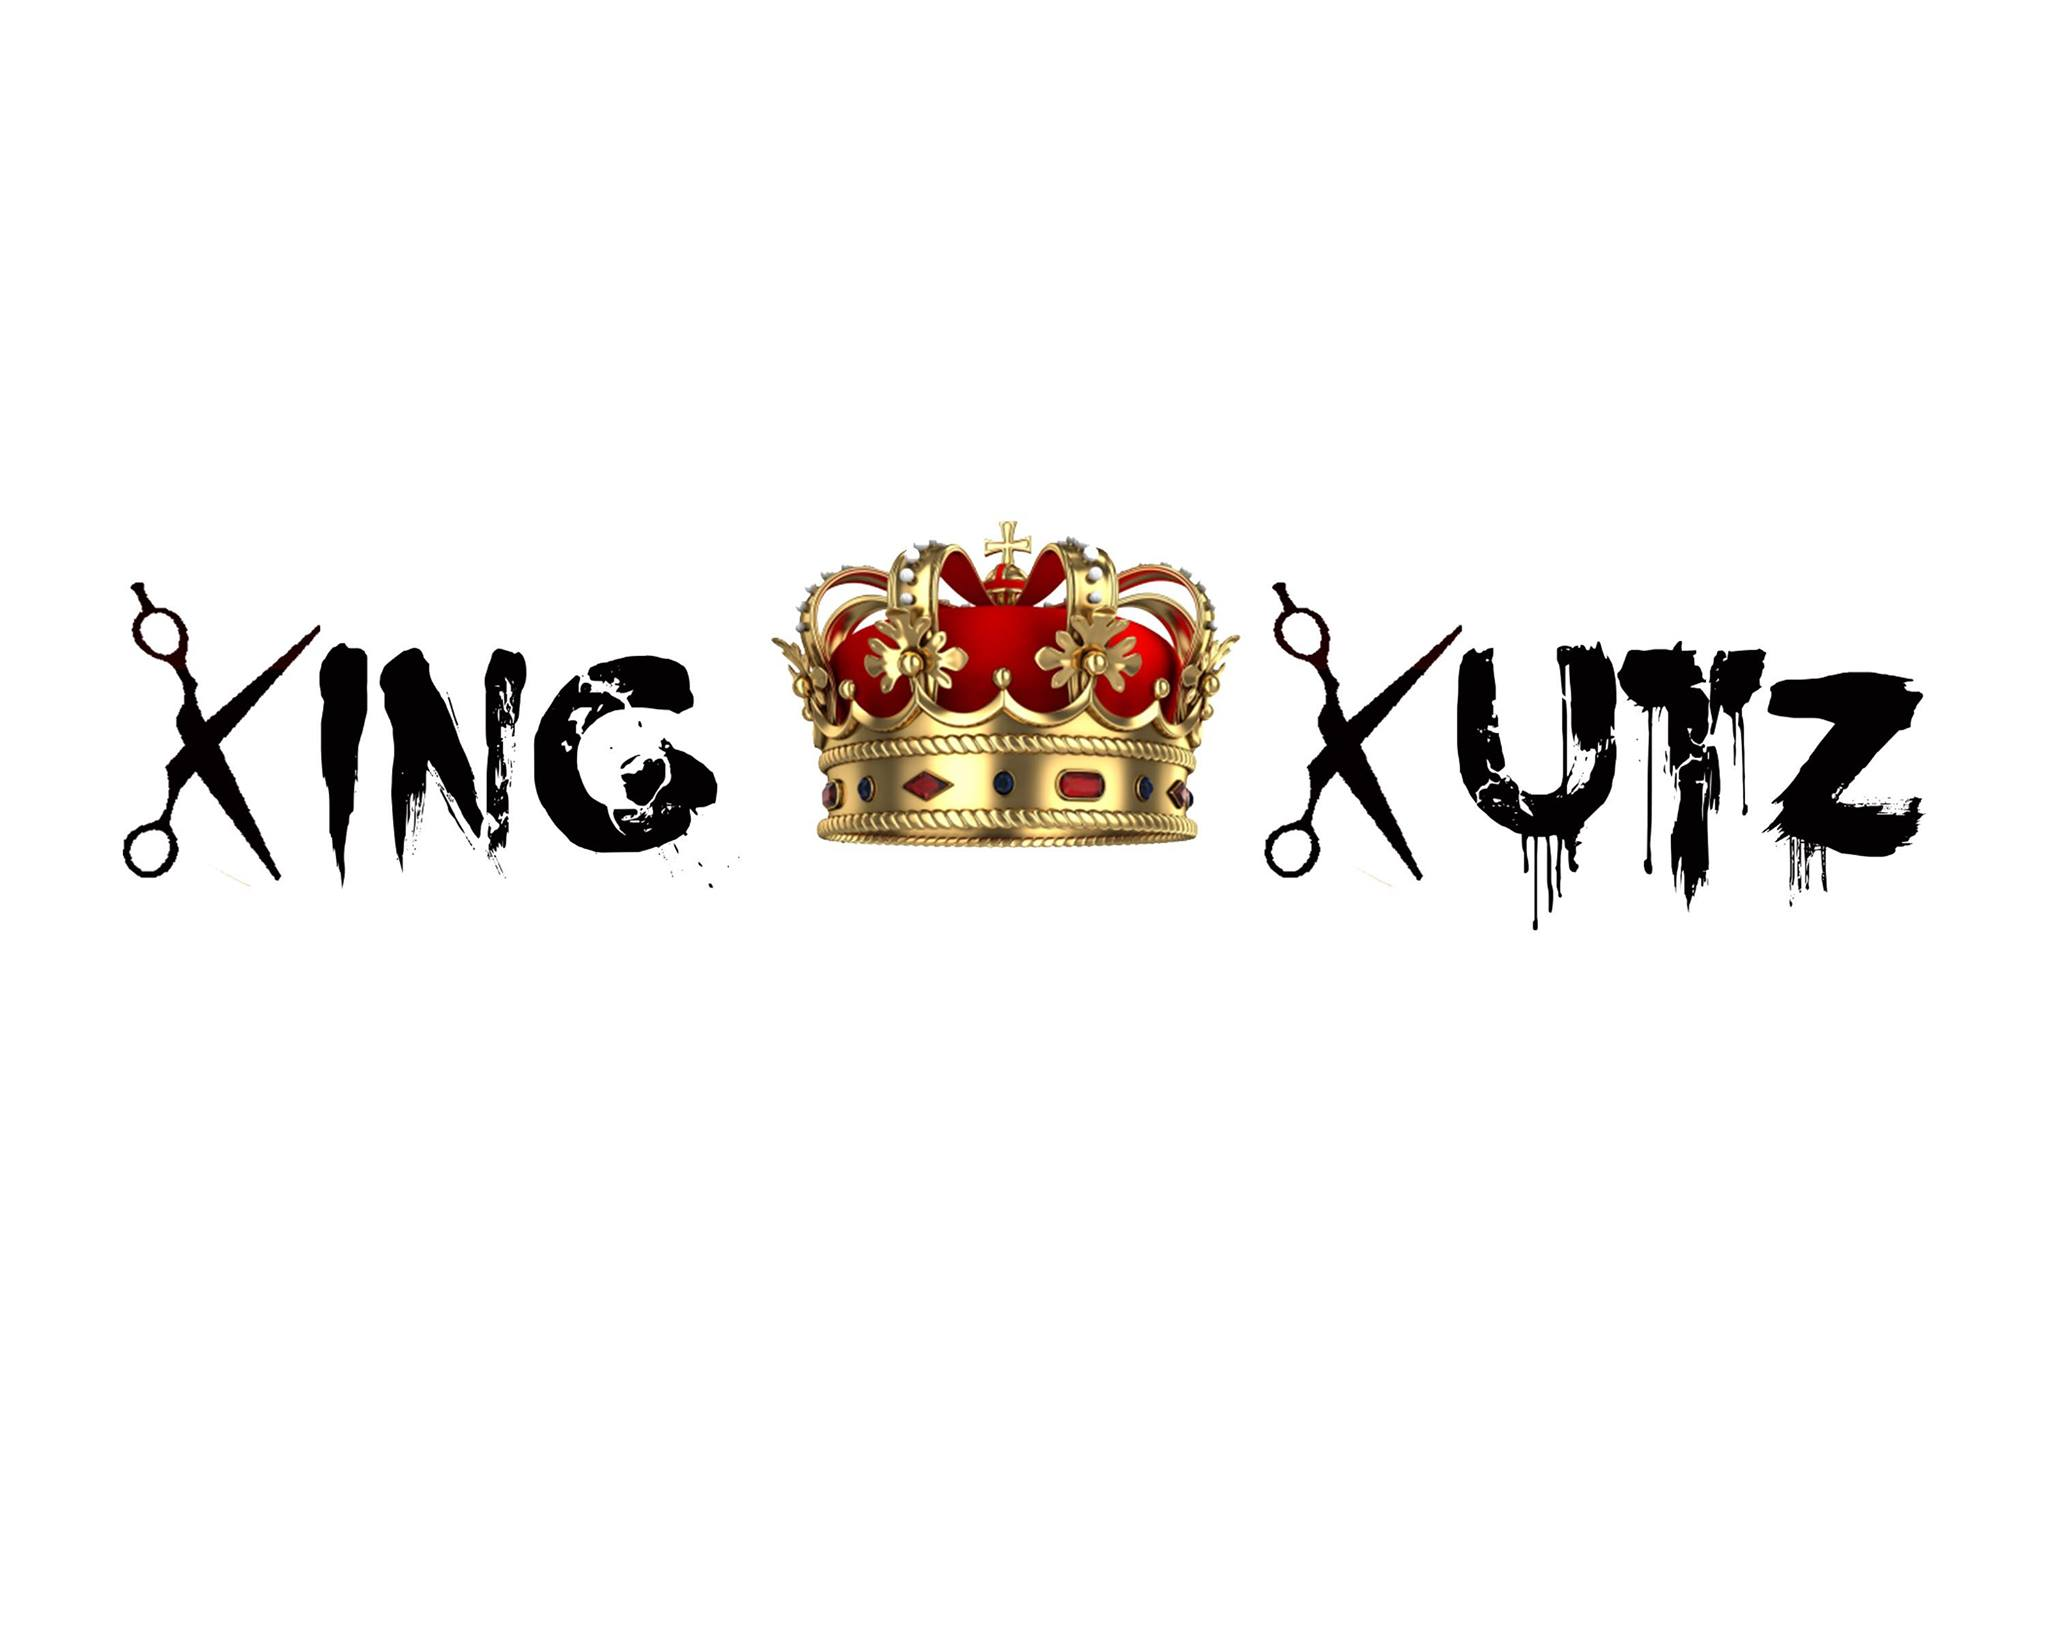 Delaware's Top Rated Local® Barber Shops Award Winner: King Kutz Barbershop LLC